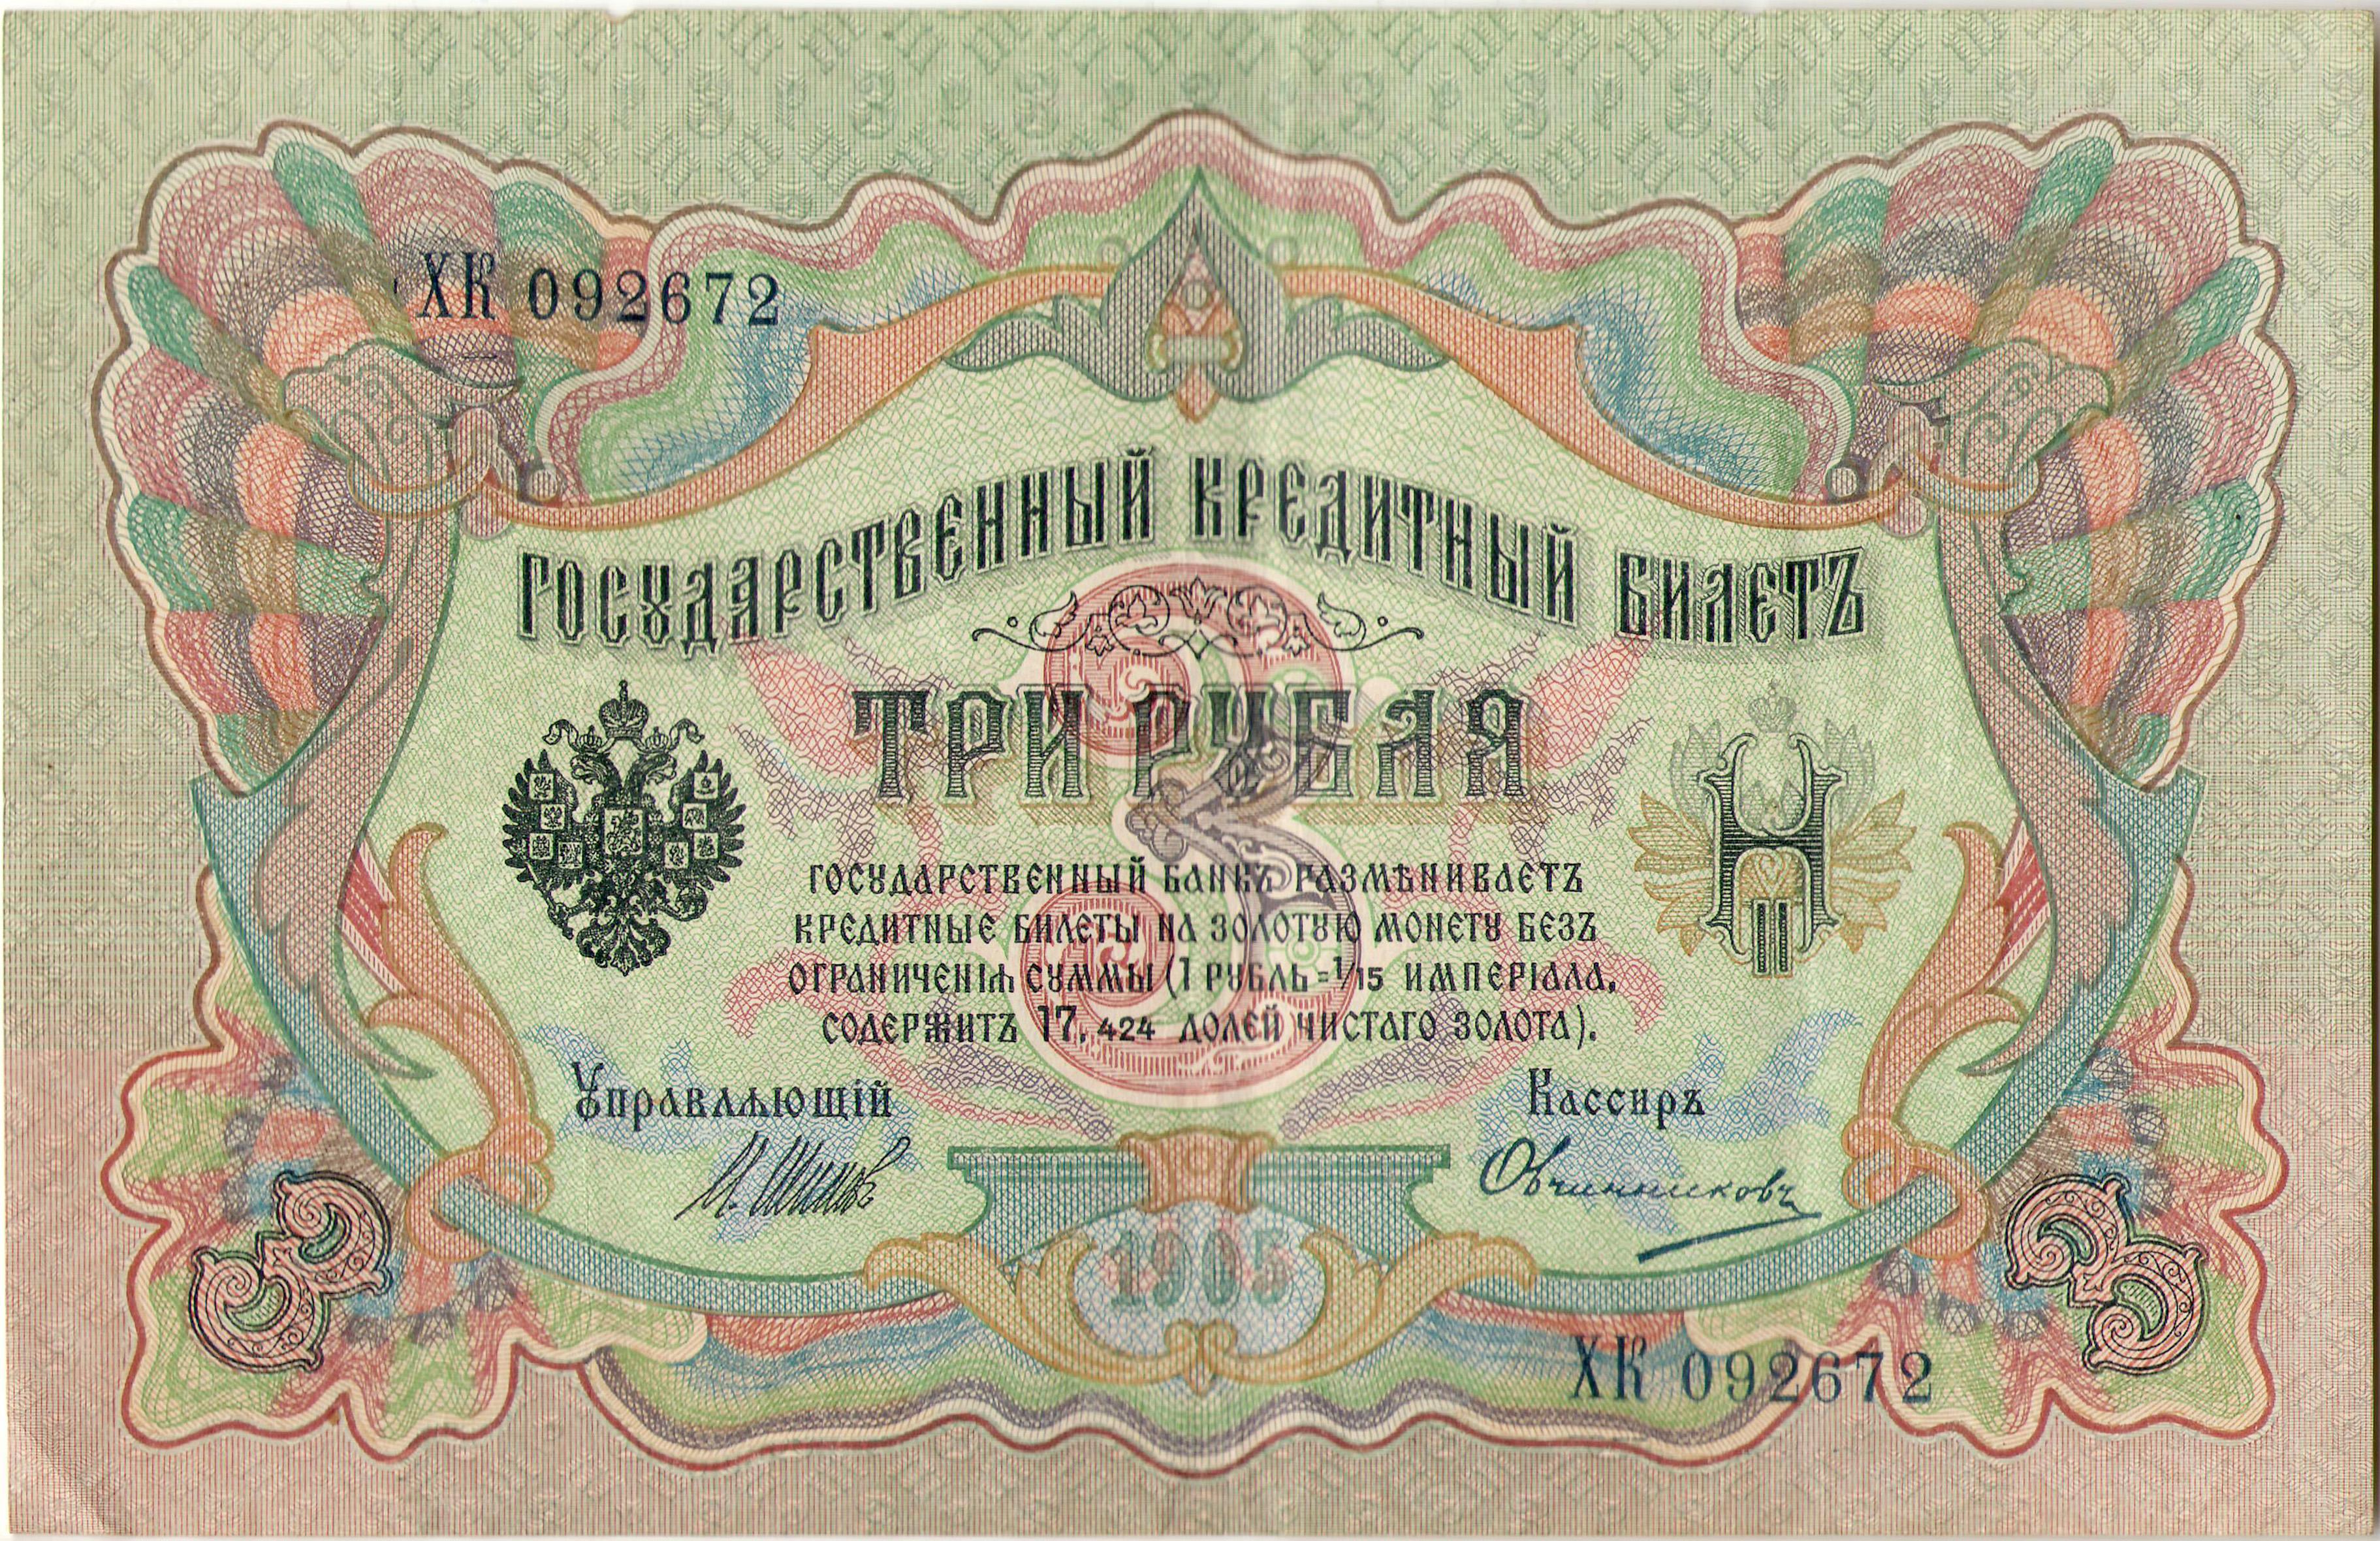 Скупка царских денег бумажных монета 15 копеек 1922 года цена